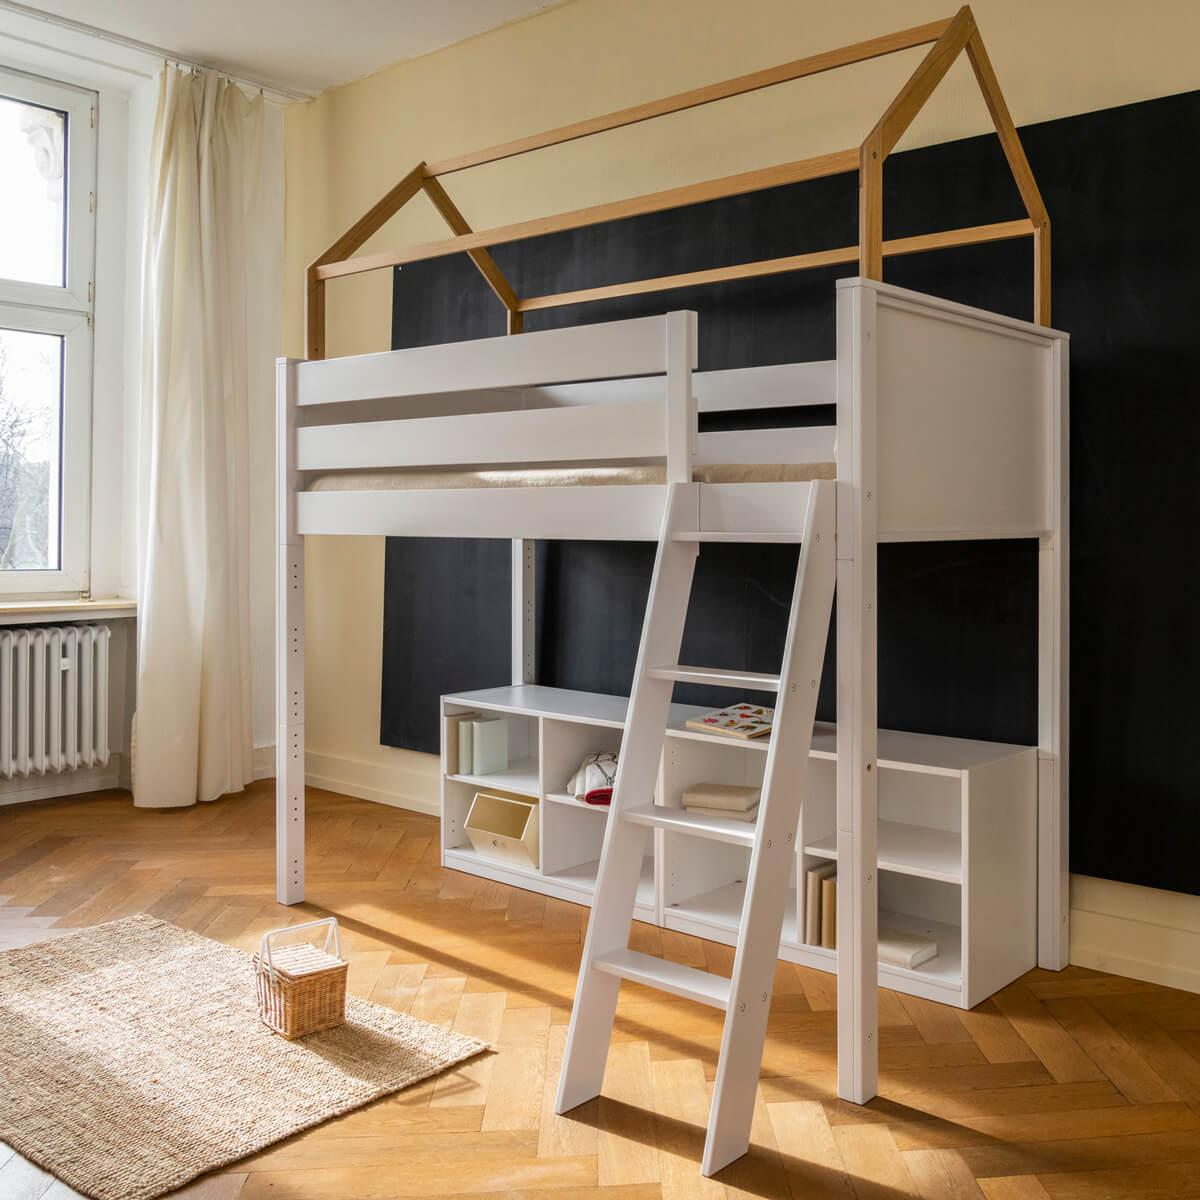 Hochbett-Dach hoch KASVA Debreuyn Buche massiv weiß-lackiert Eiche furniert-geölt